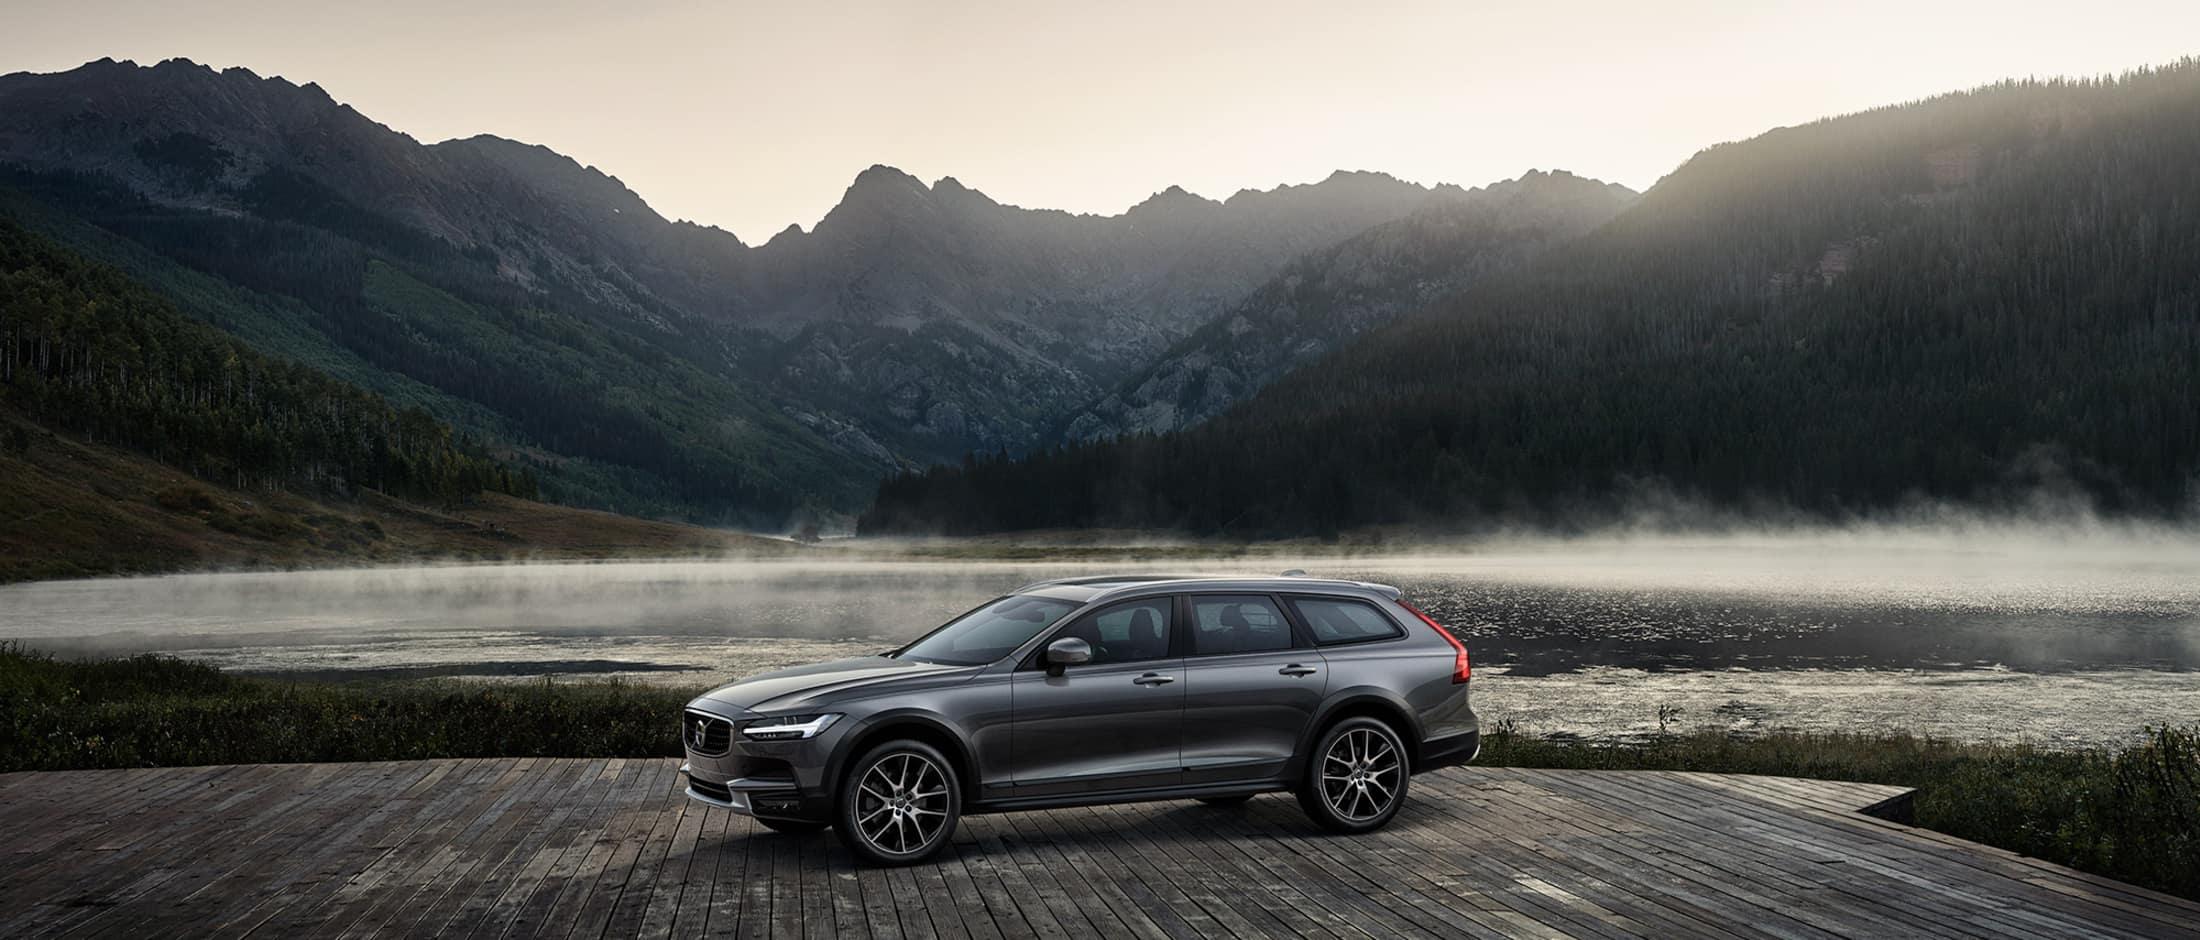 Volvo V90 Cross Country parkert på platting foran fjord i tåketeppe